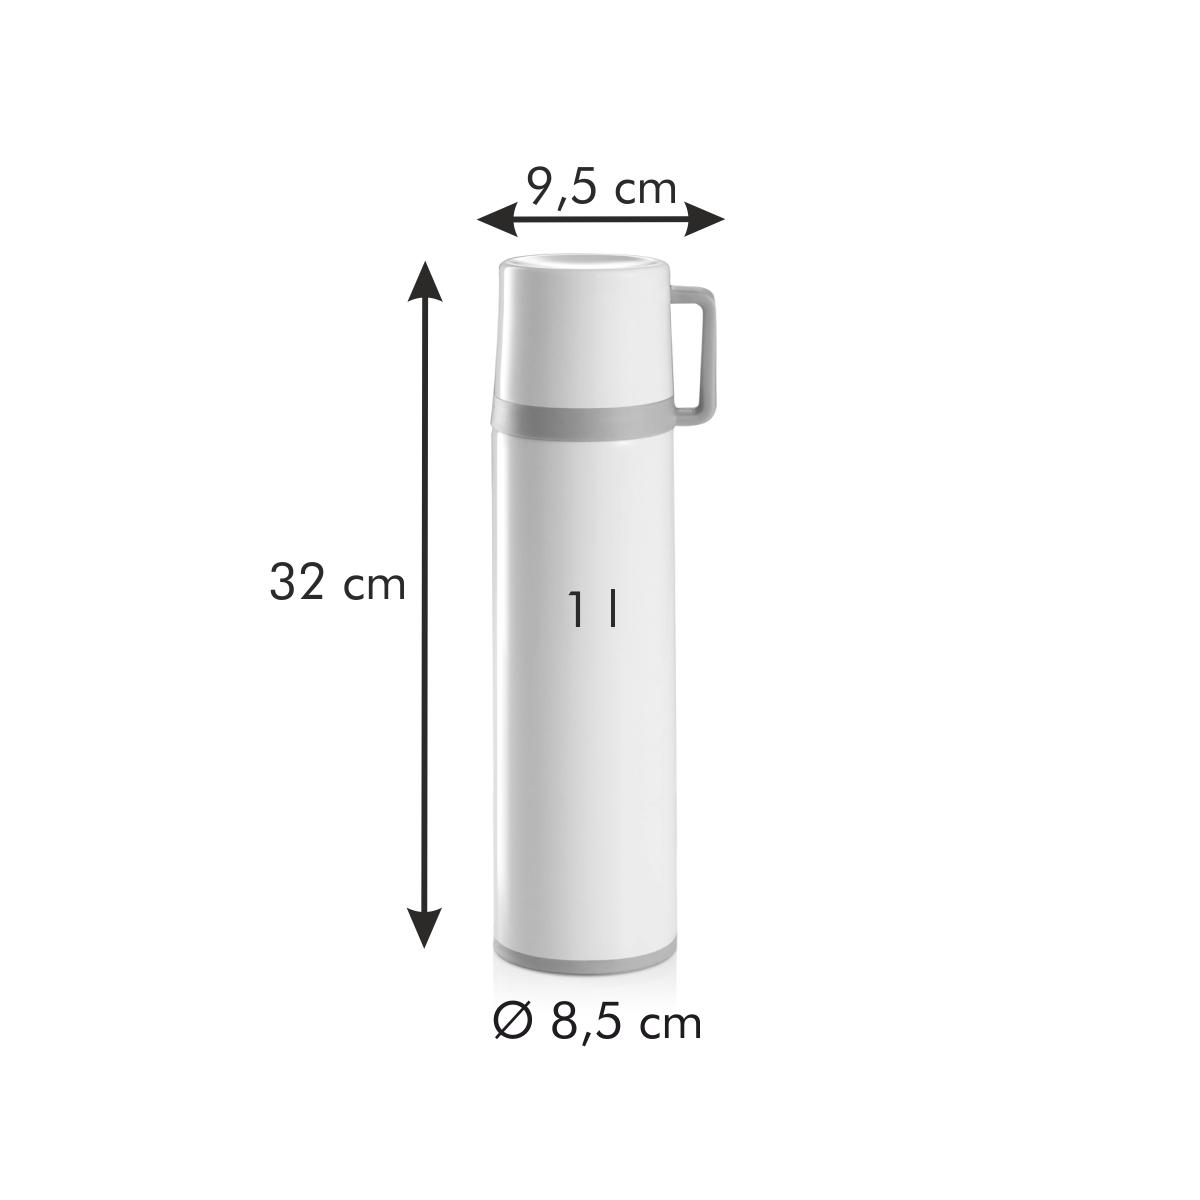 Termoska s hrníčkem CONSTANT CREAM 1,0 l, nerez